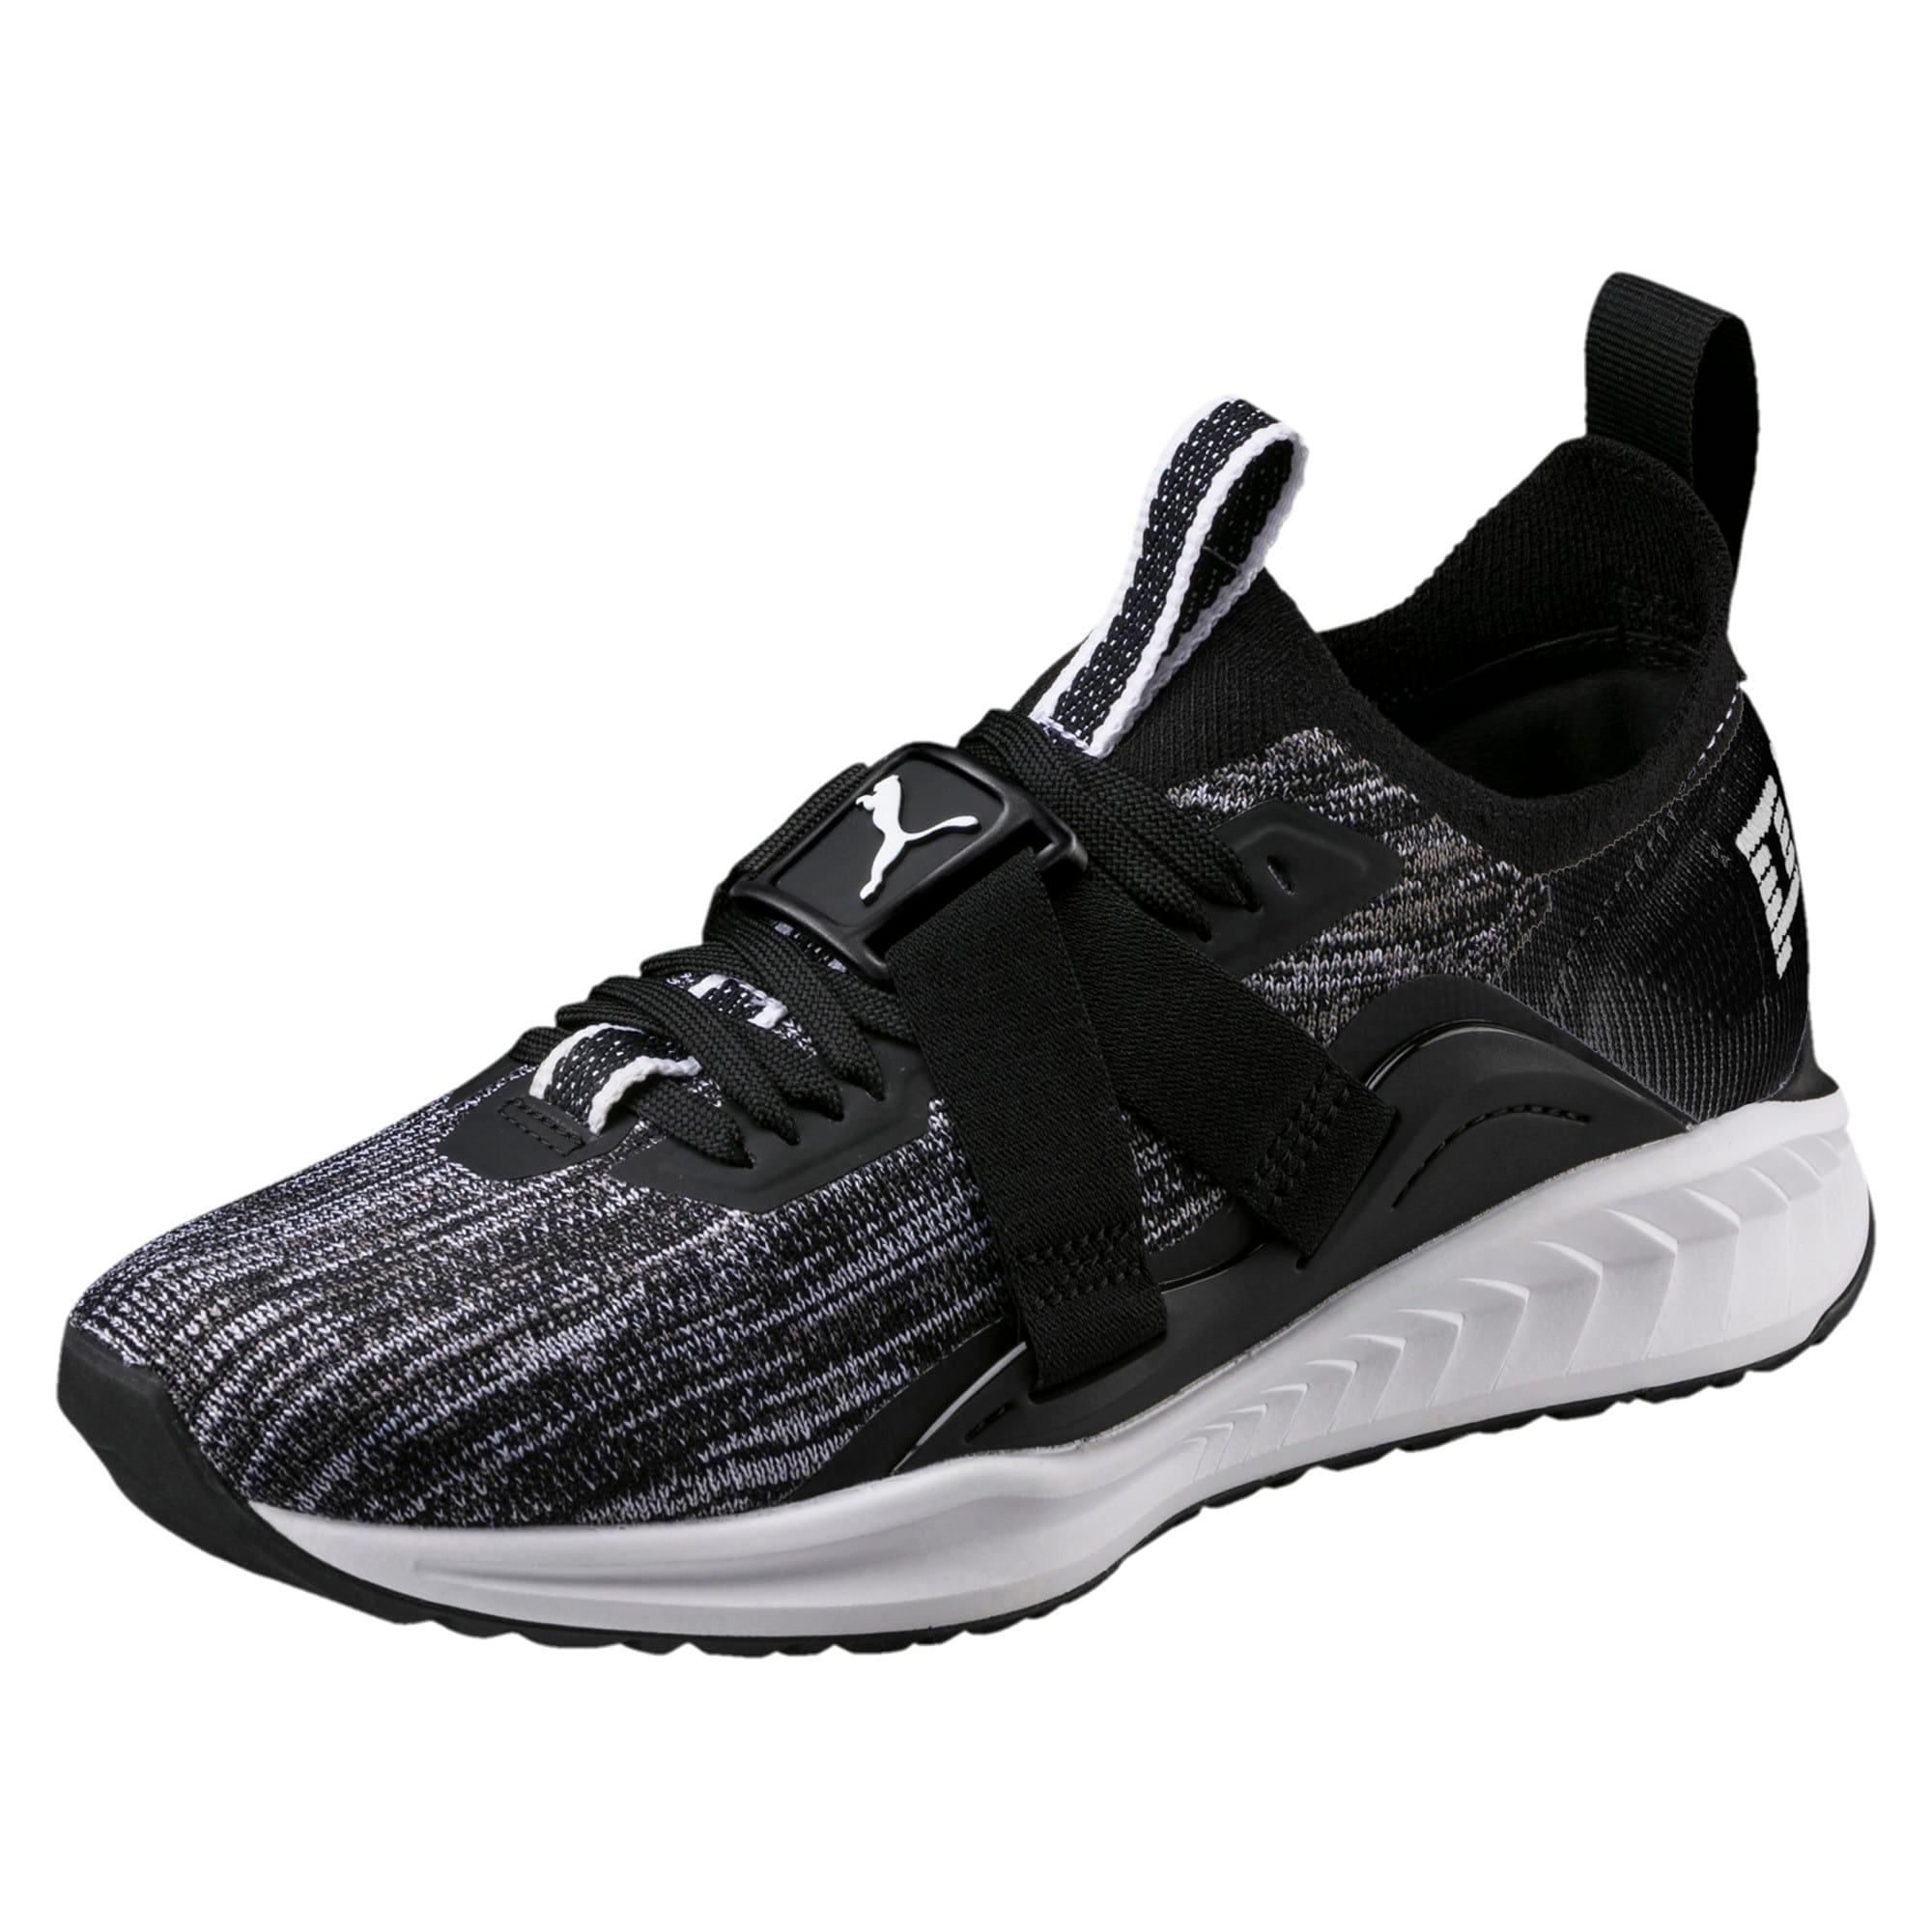 IGNITE evoKNIT 2 Lo Women's Shoes